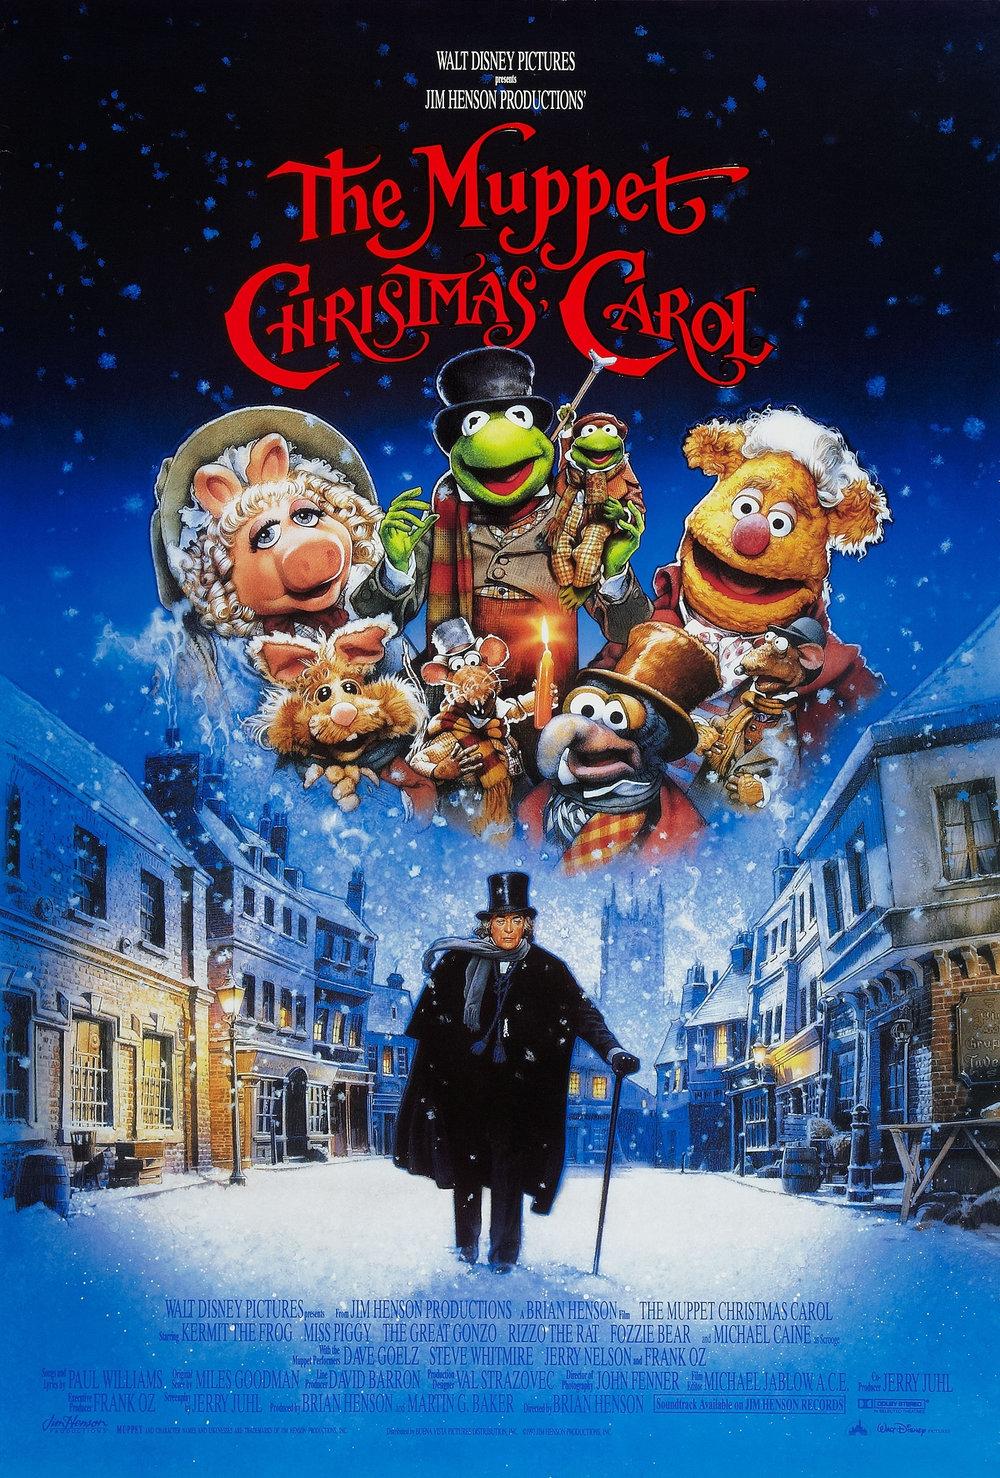 Muppets christmas carol.jpg